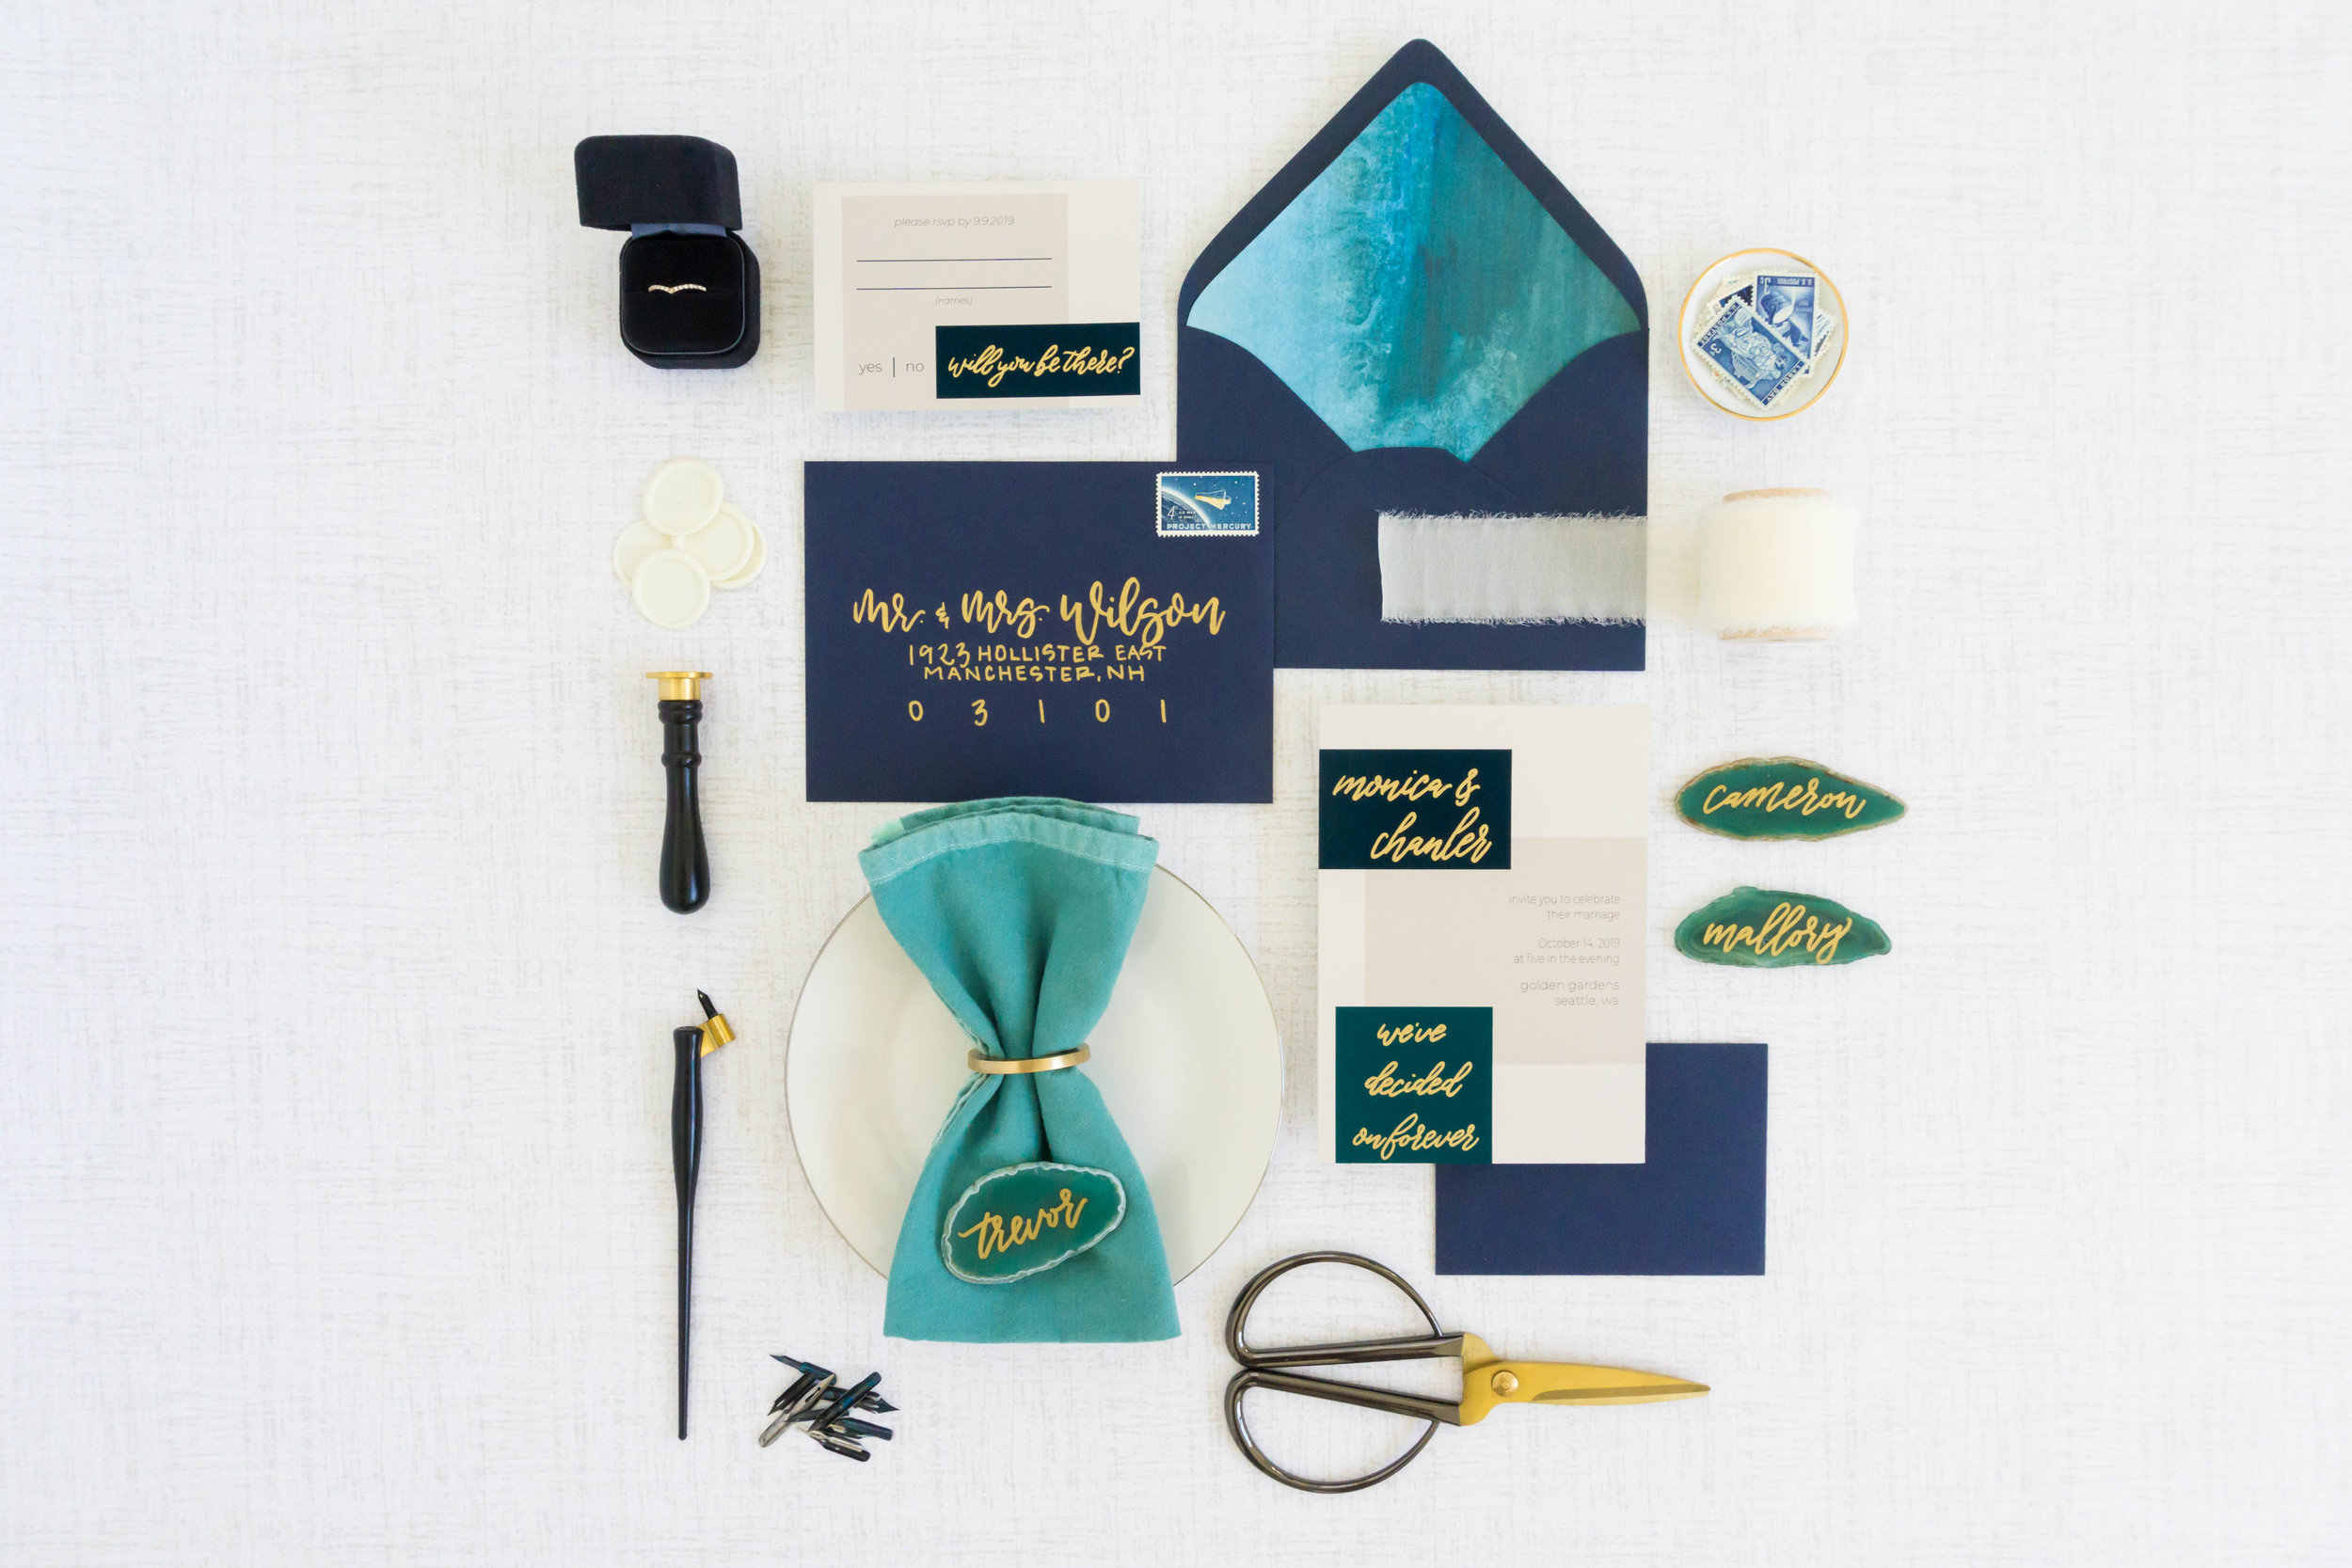 love-fern-design-studio-custom-wedding-invitations-for-the-modern-couple-modern-calligraphy-in-seattle-washington-custom-wedding-stationery19.jpg